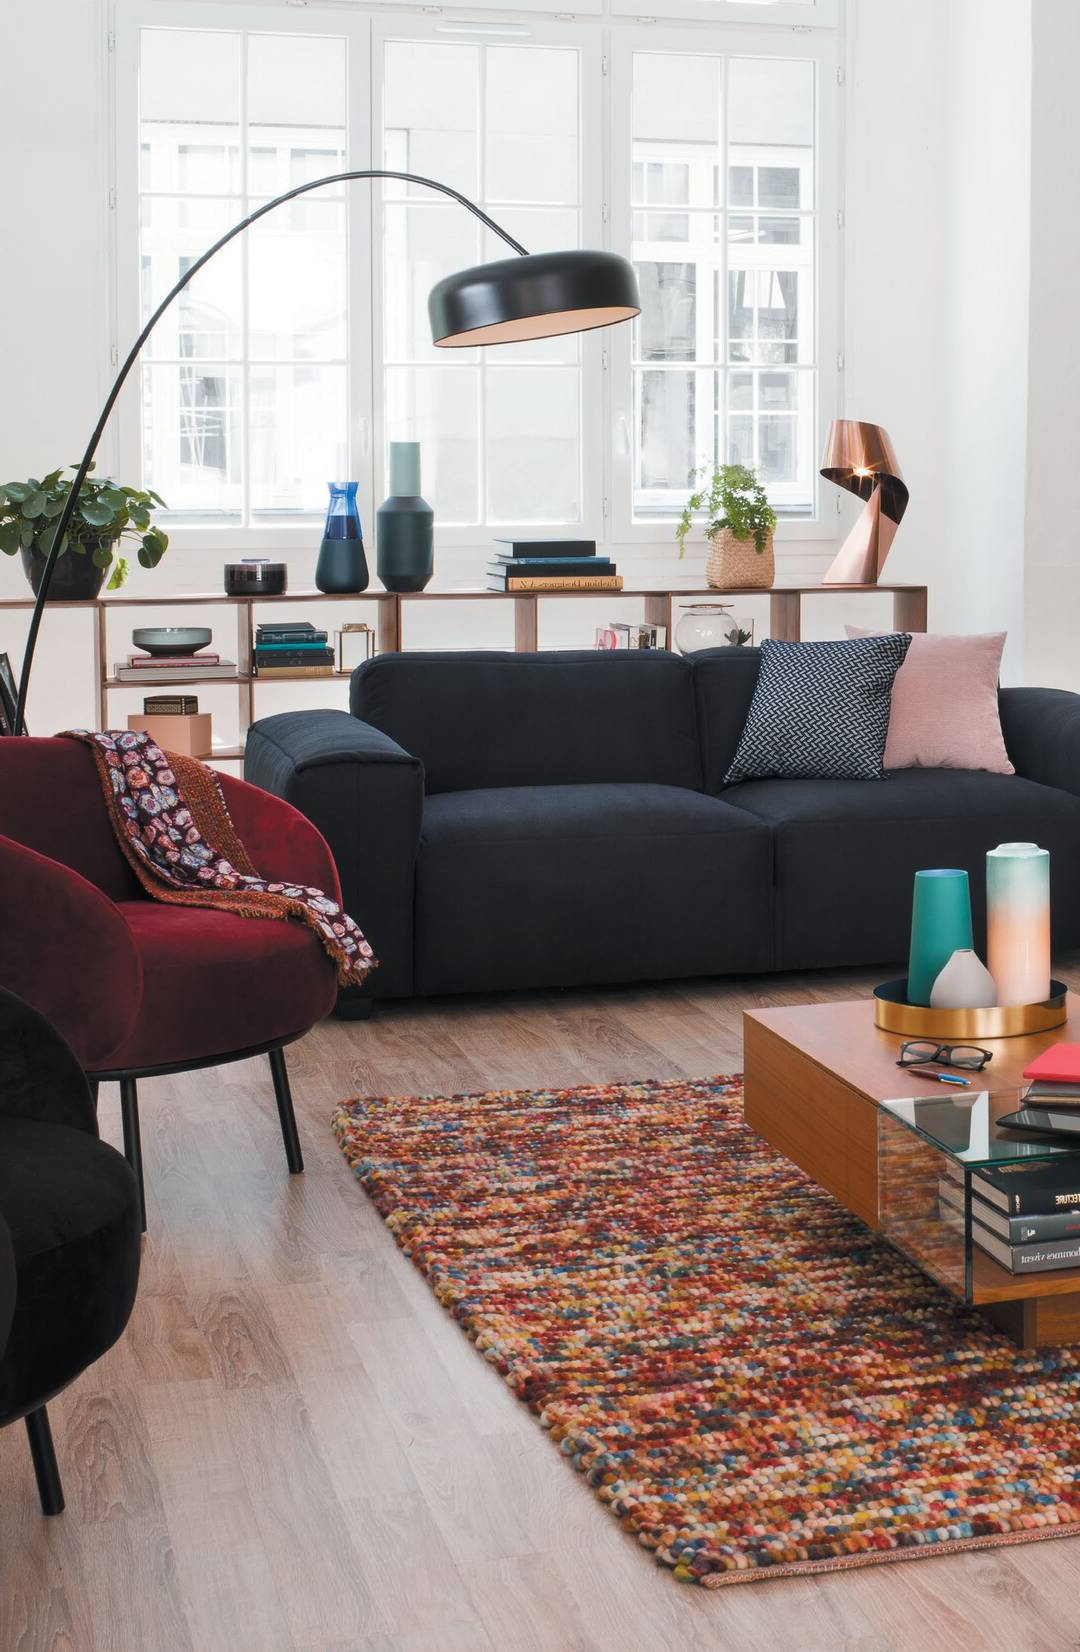 Sofas & Armchairs – Issuu Regarding Well Liked Kasha Armchairs (View 13 of 20)